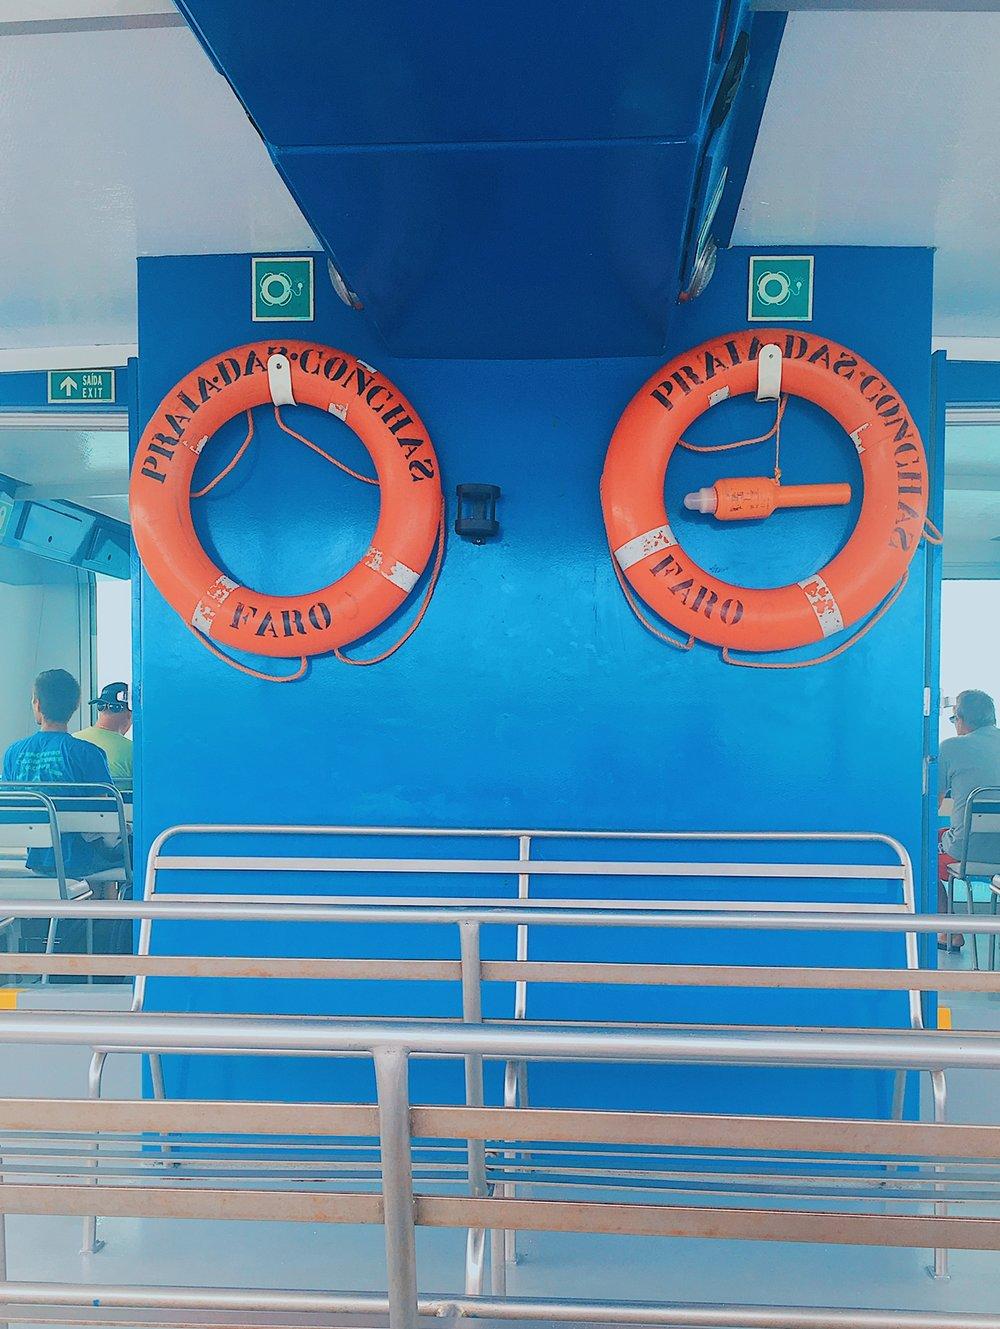 Aboard the ferry to Ilha Deserta